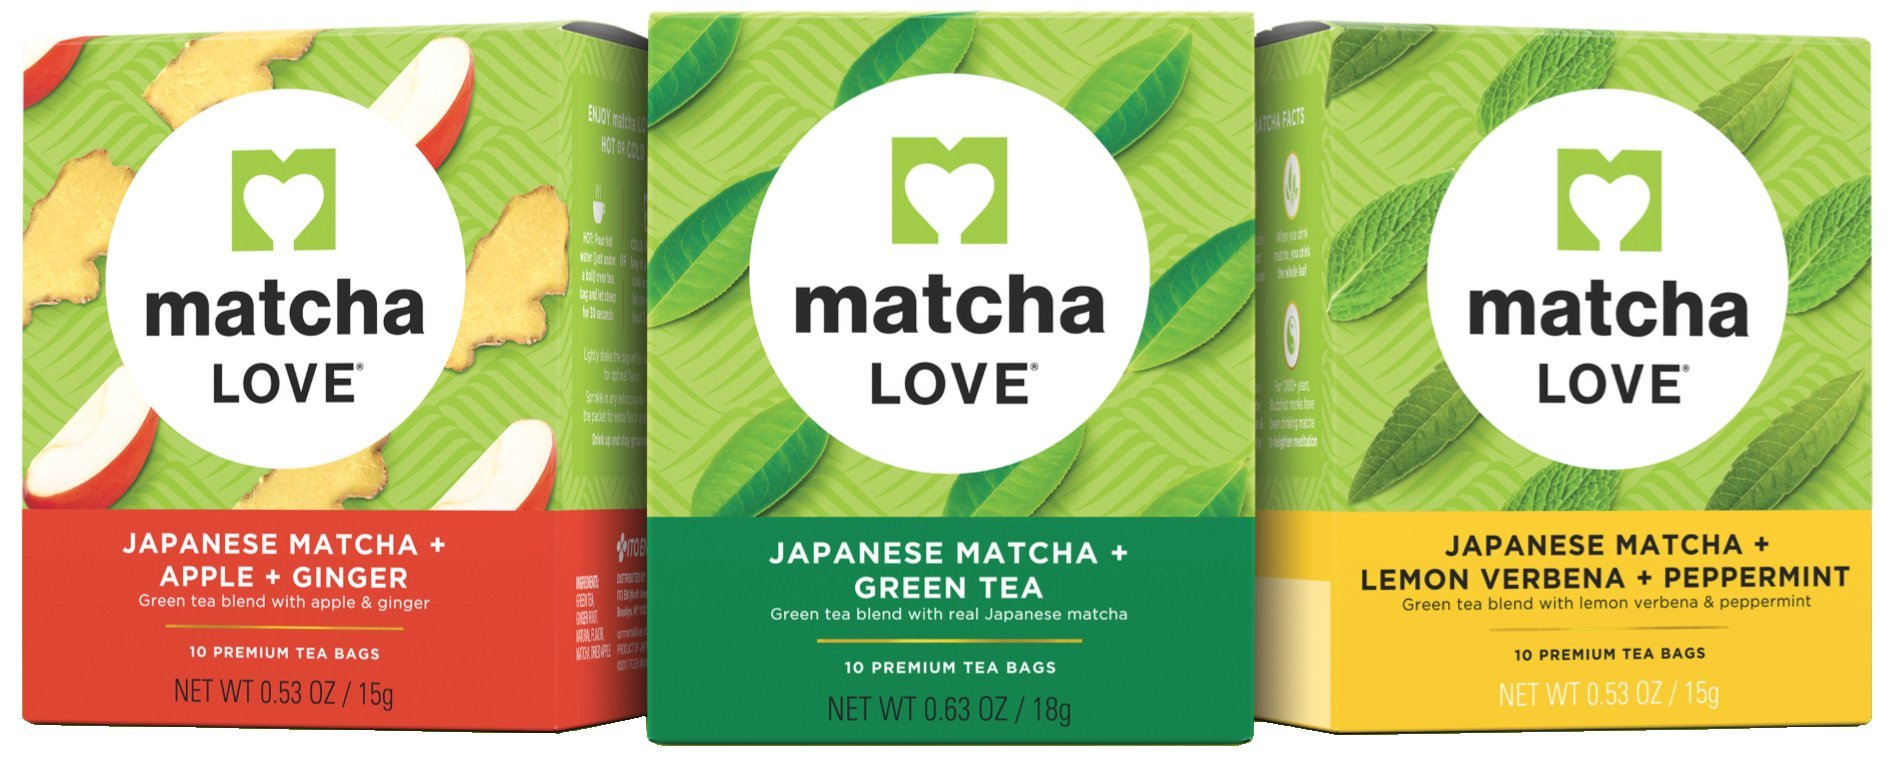 Matcha Love Japanese Matcha Premium Tea Bags Variety Pack, 10 per box (Pack of 3)